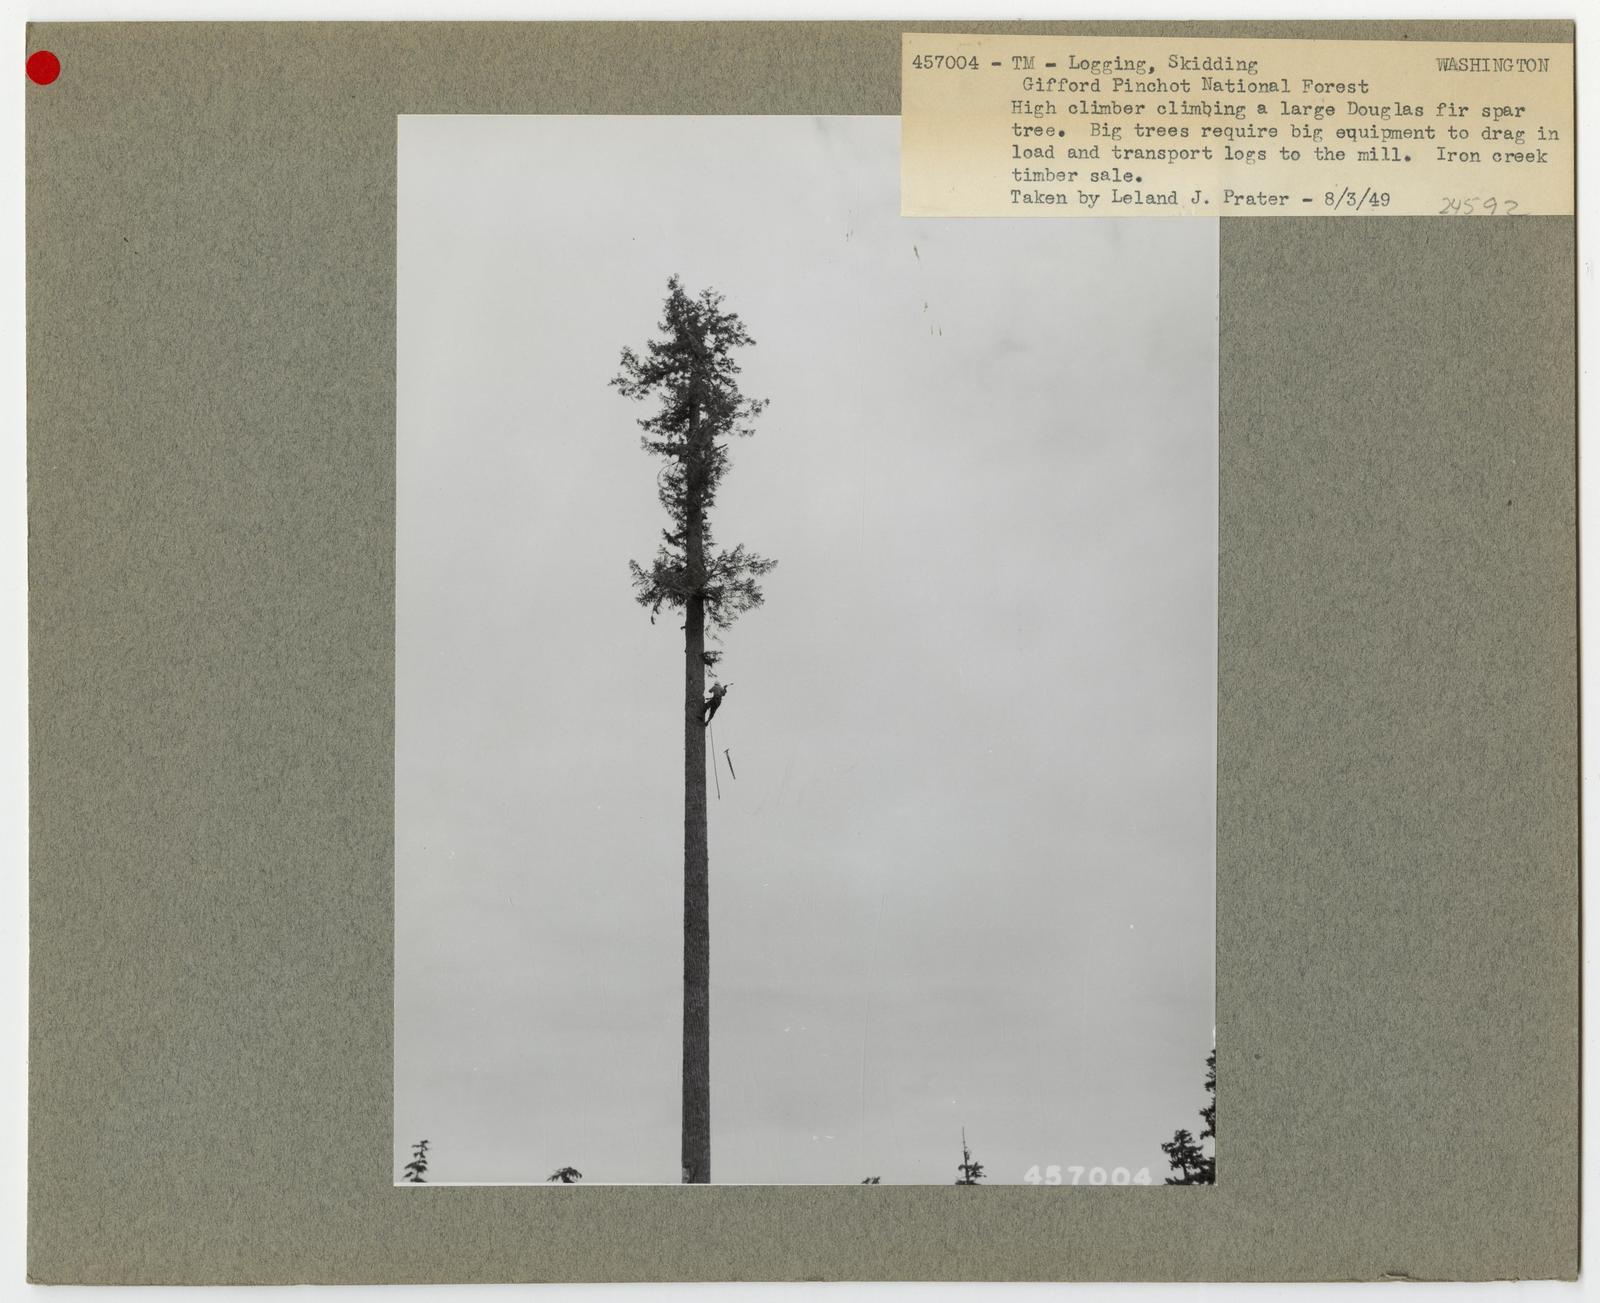 Logging: High Lead Log Skidding - Washington